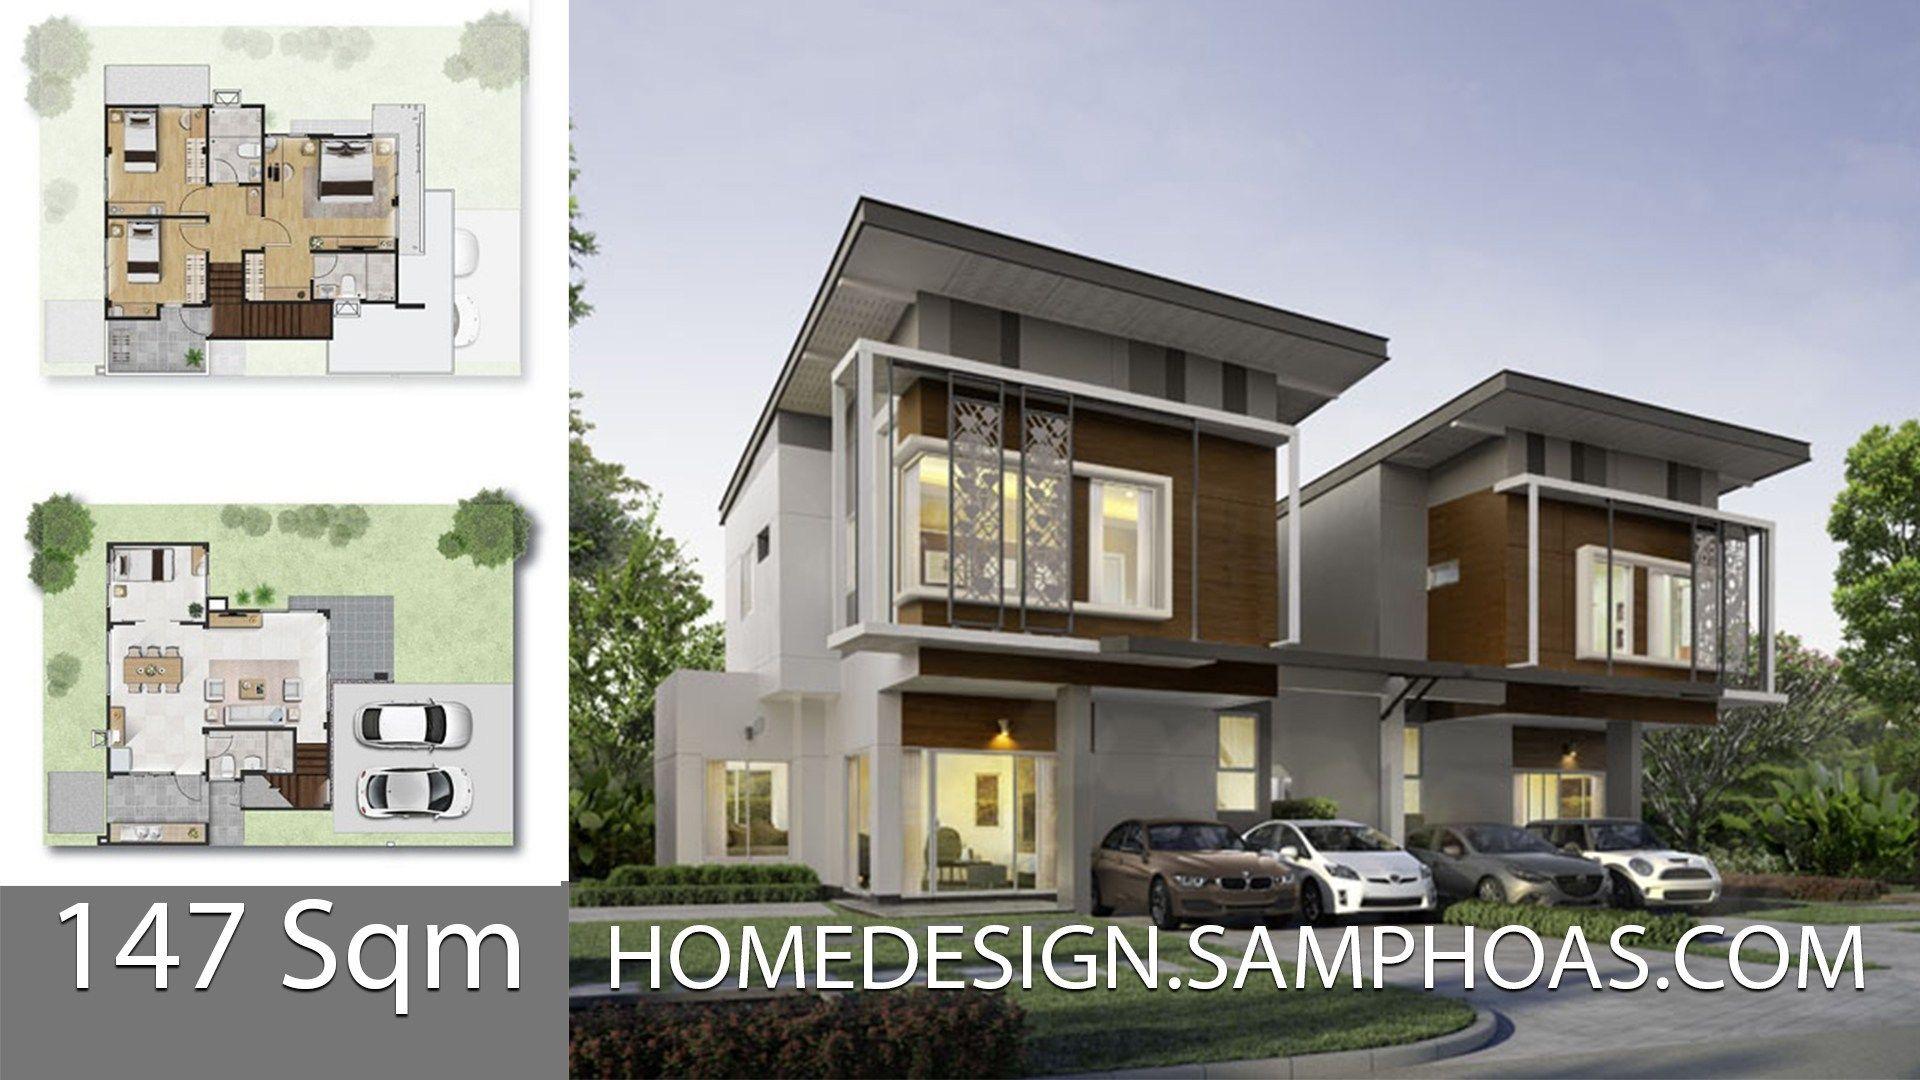 147 Sqm 3 Bedrooms Home Design Idea House Design House Plan Gallery Home Design Plans